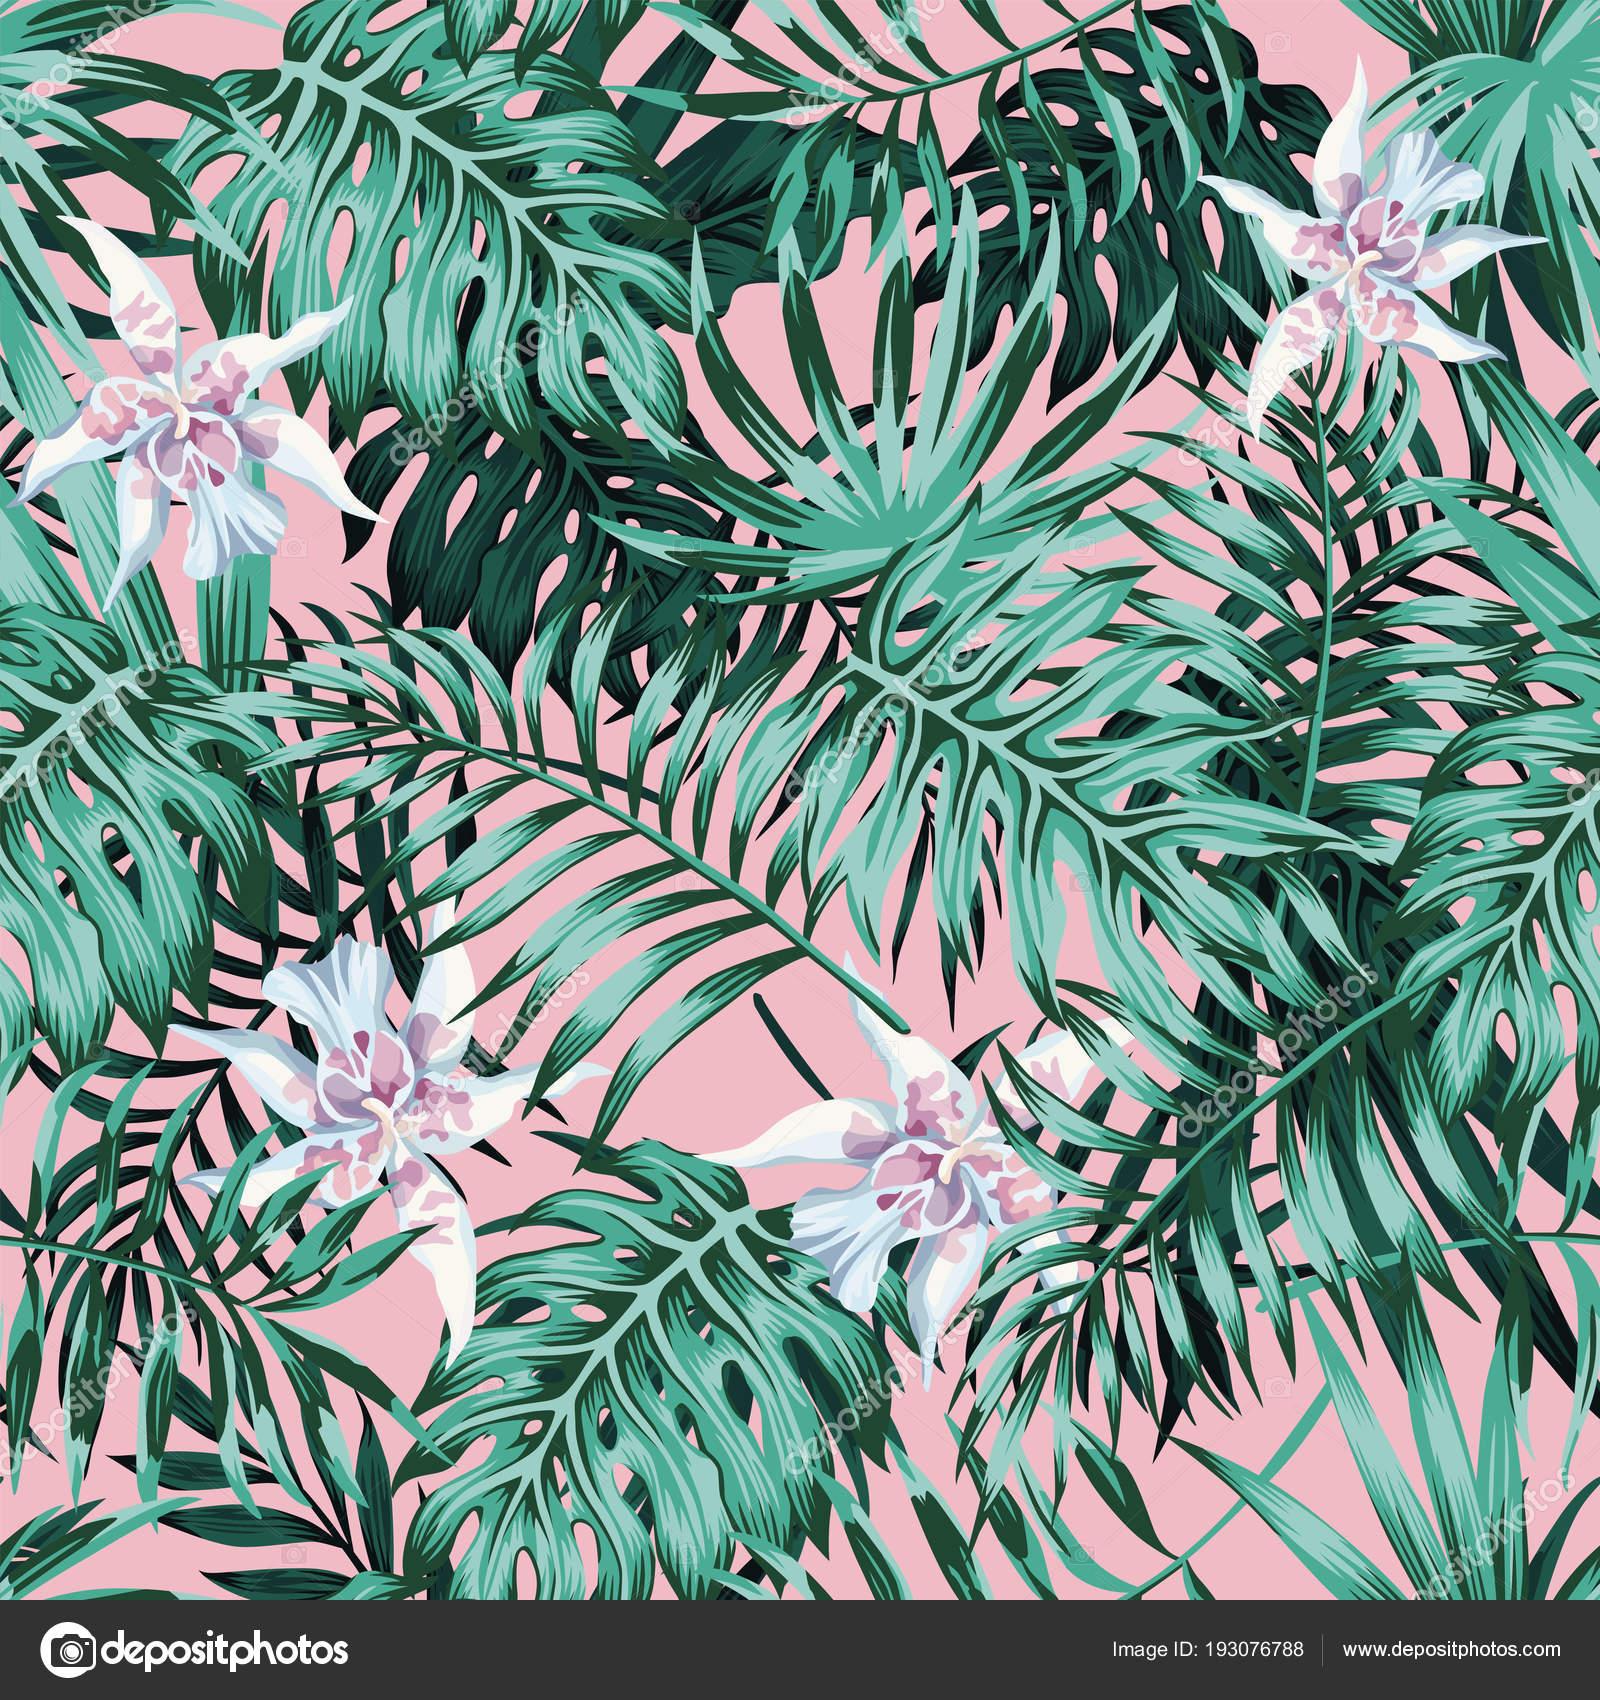 Palm Leaves Pink Background Pattern Stock Vector C Berry2046 193076788 Tropical leaves on pink background. https depositphotos com 193076788 stock illustration palm leaves pink background pattern html